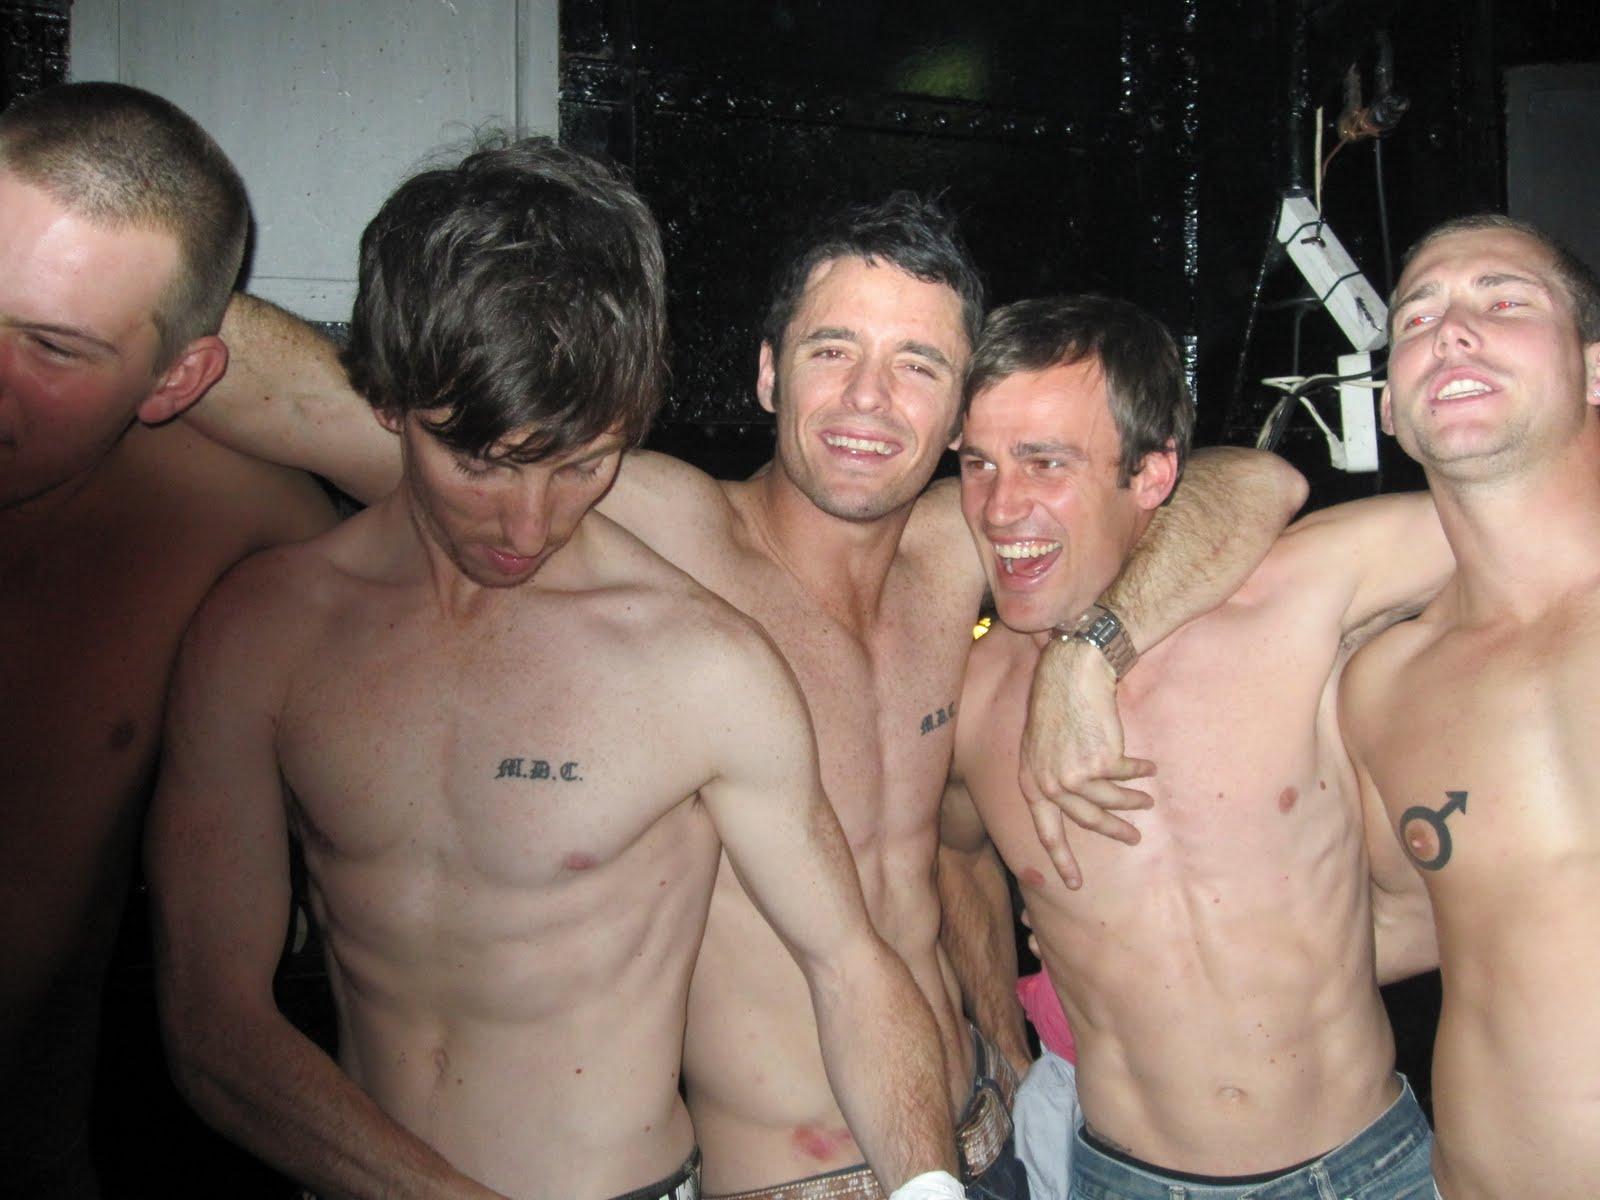 The outcome a bunch of bare chested men despite the 5 degree